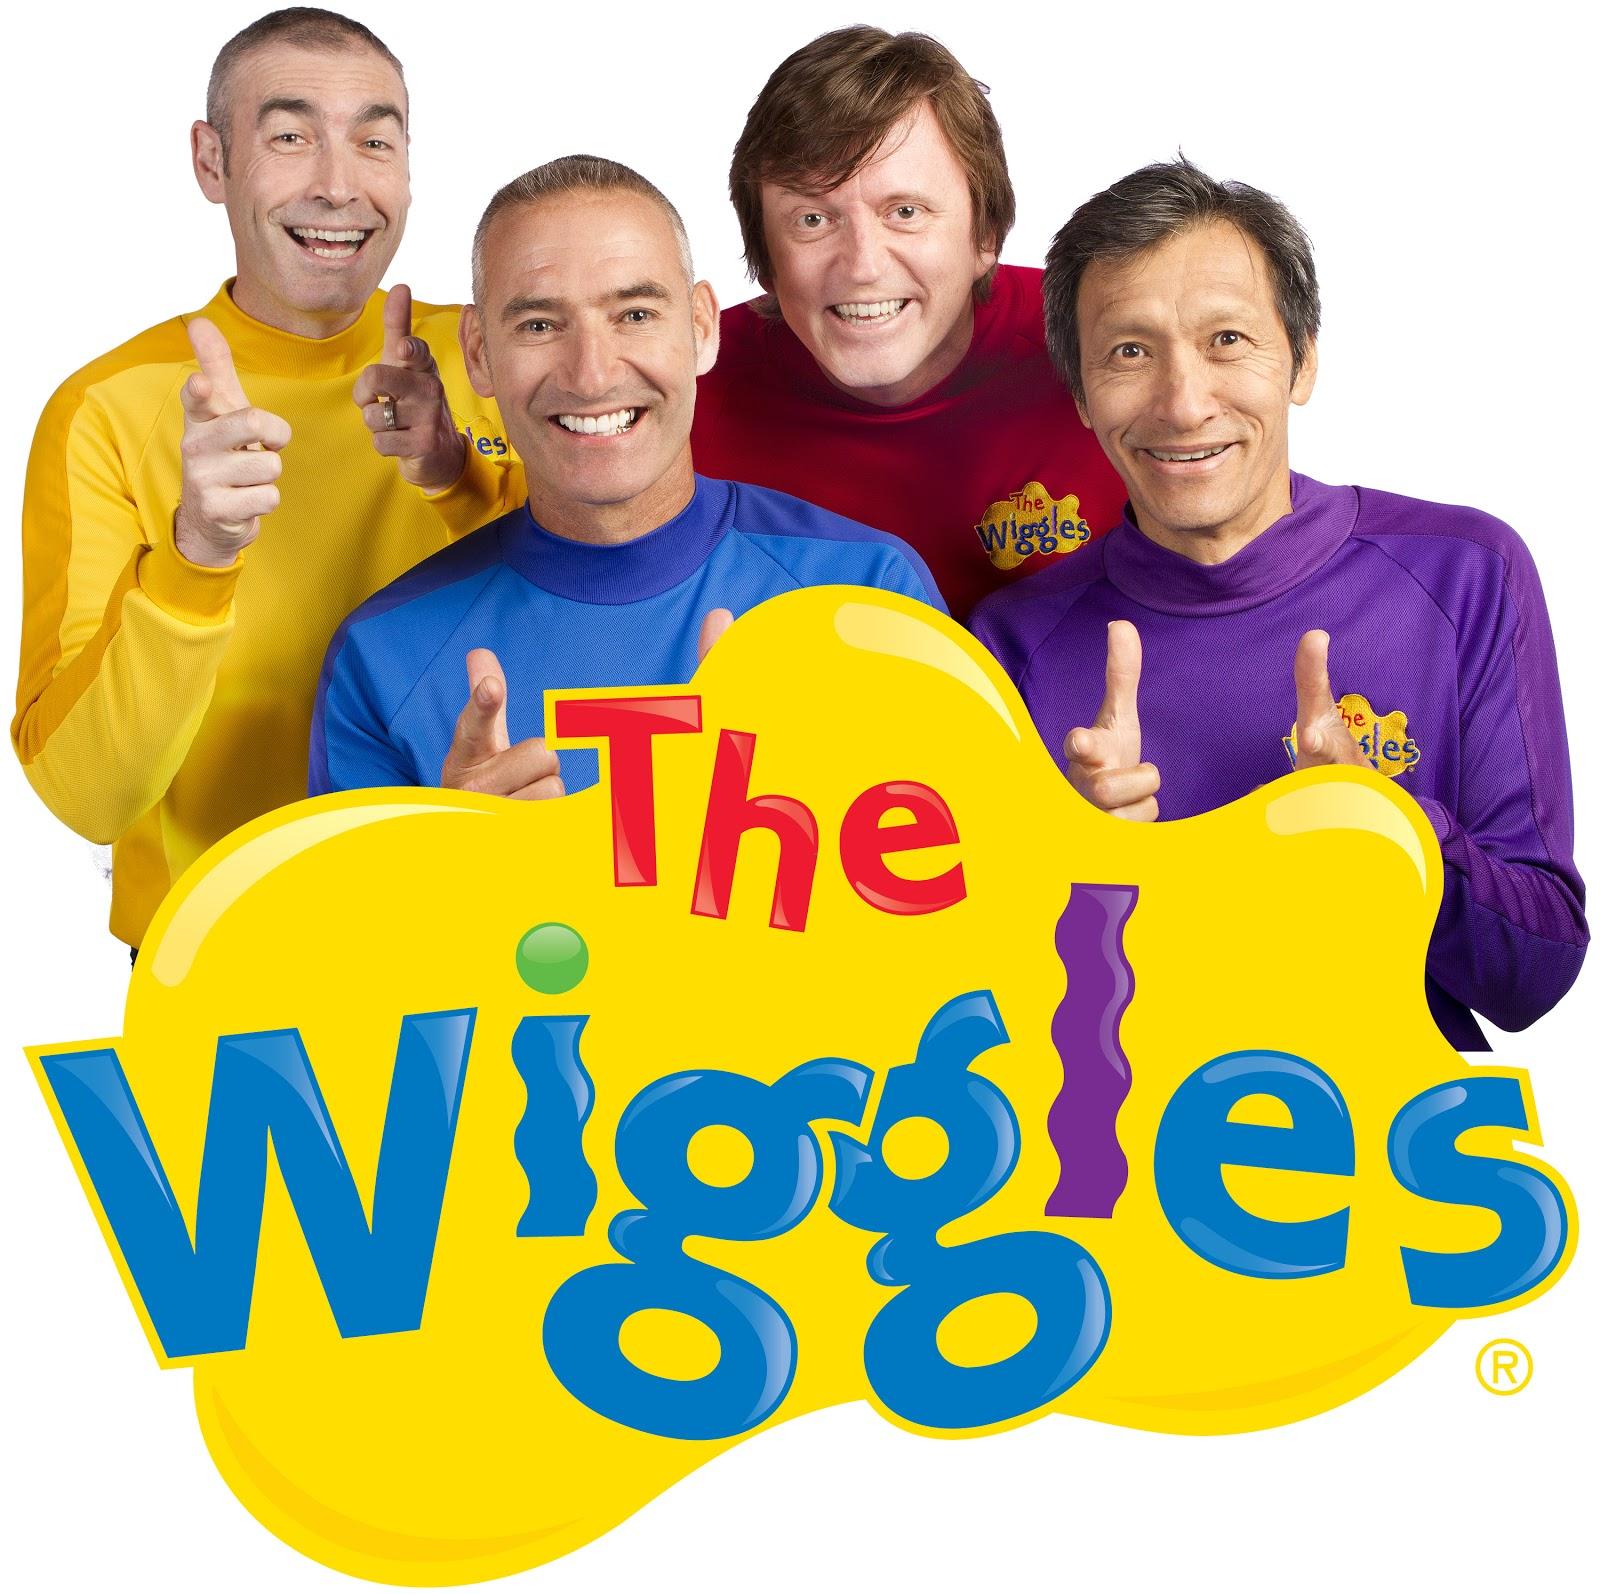 Wiggles.jpg